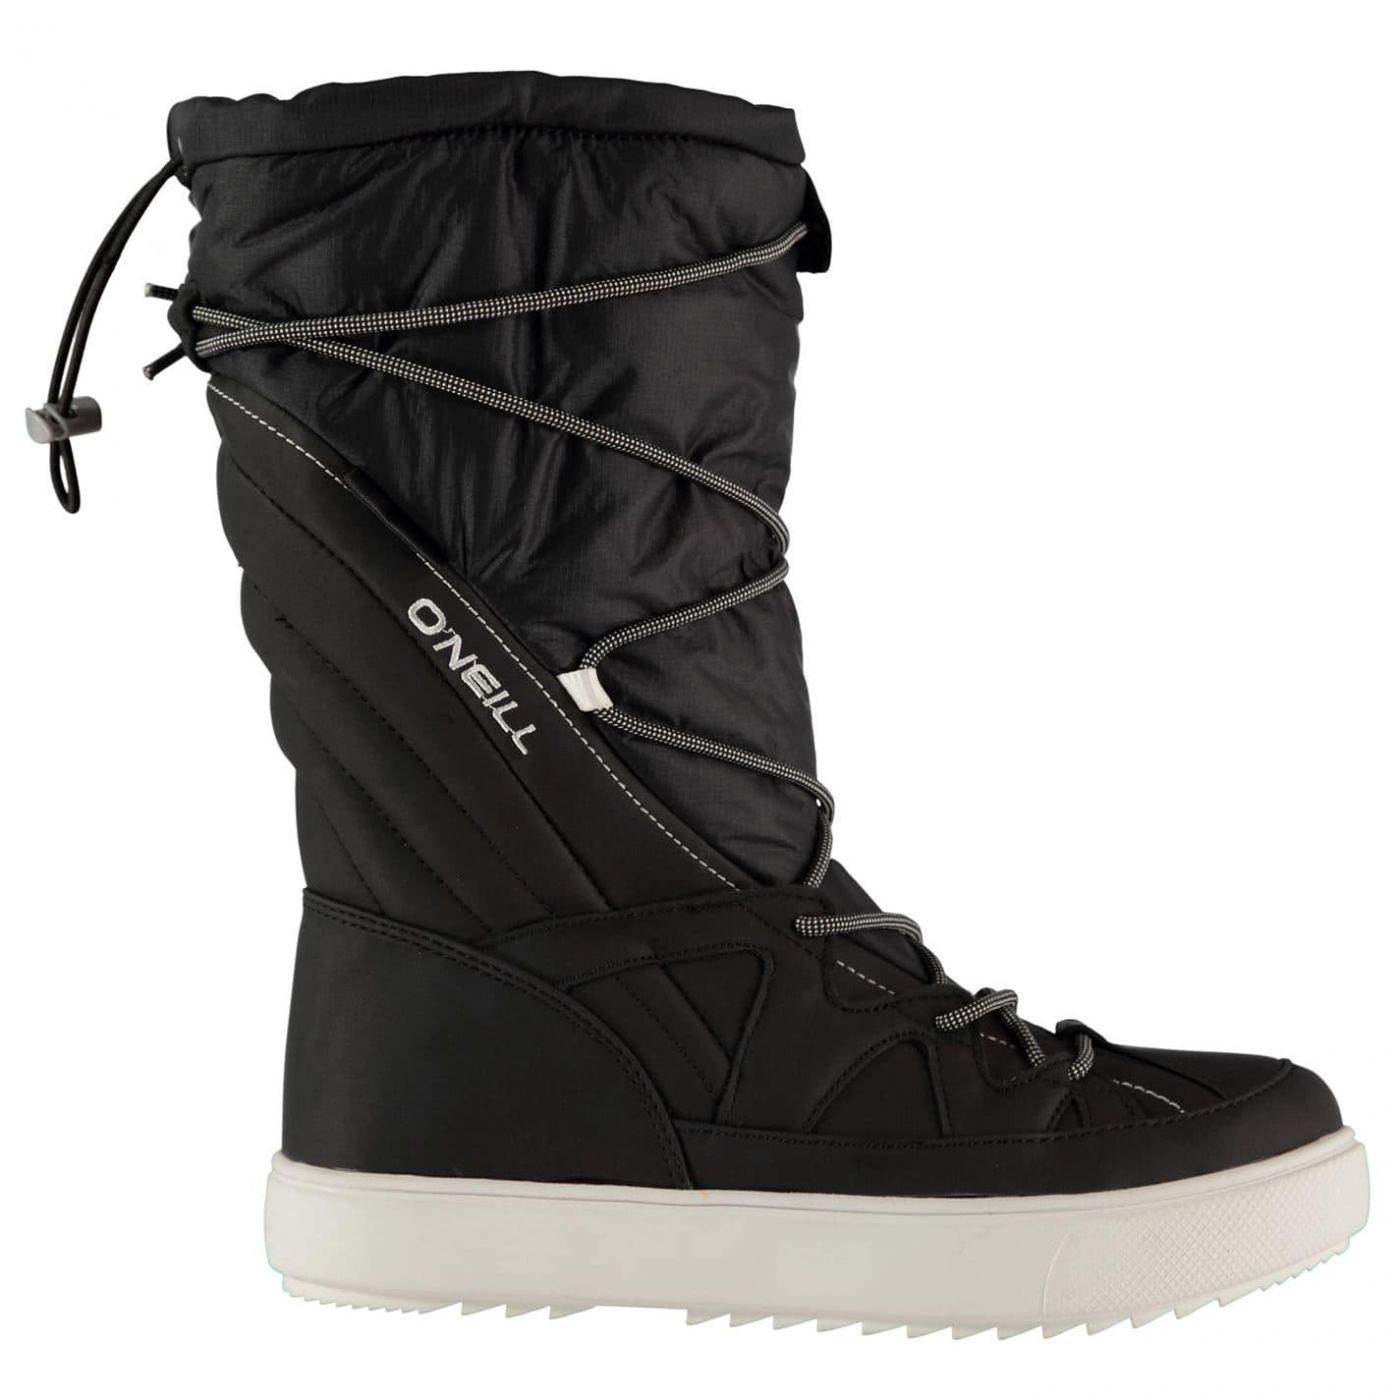 ONeill Montabella Ladies Snow Boots